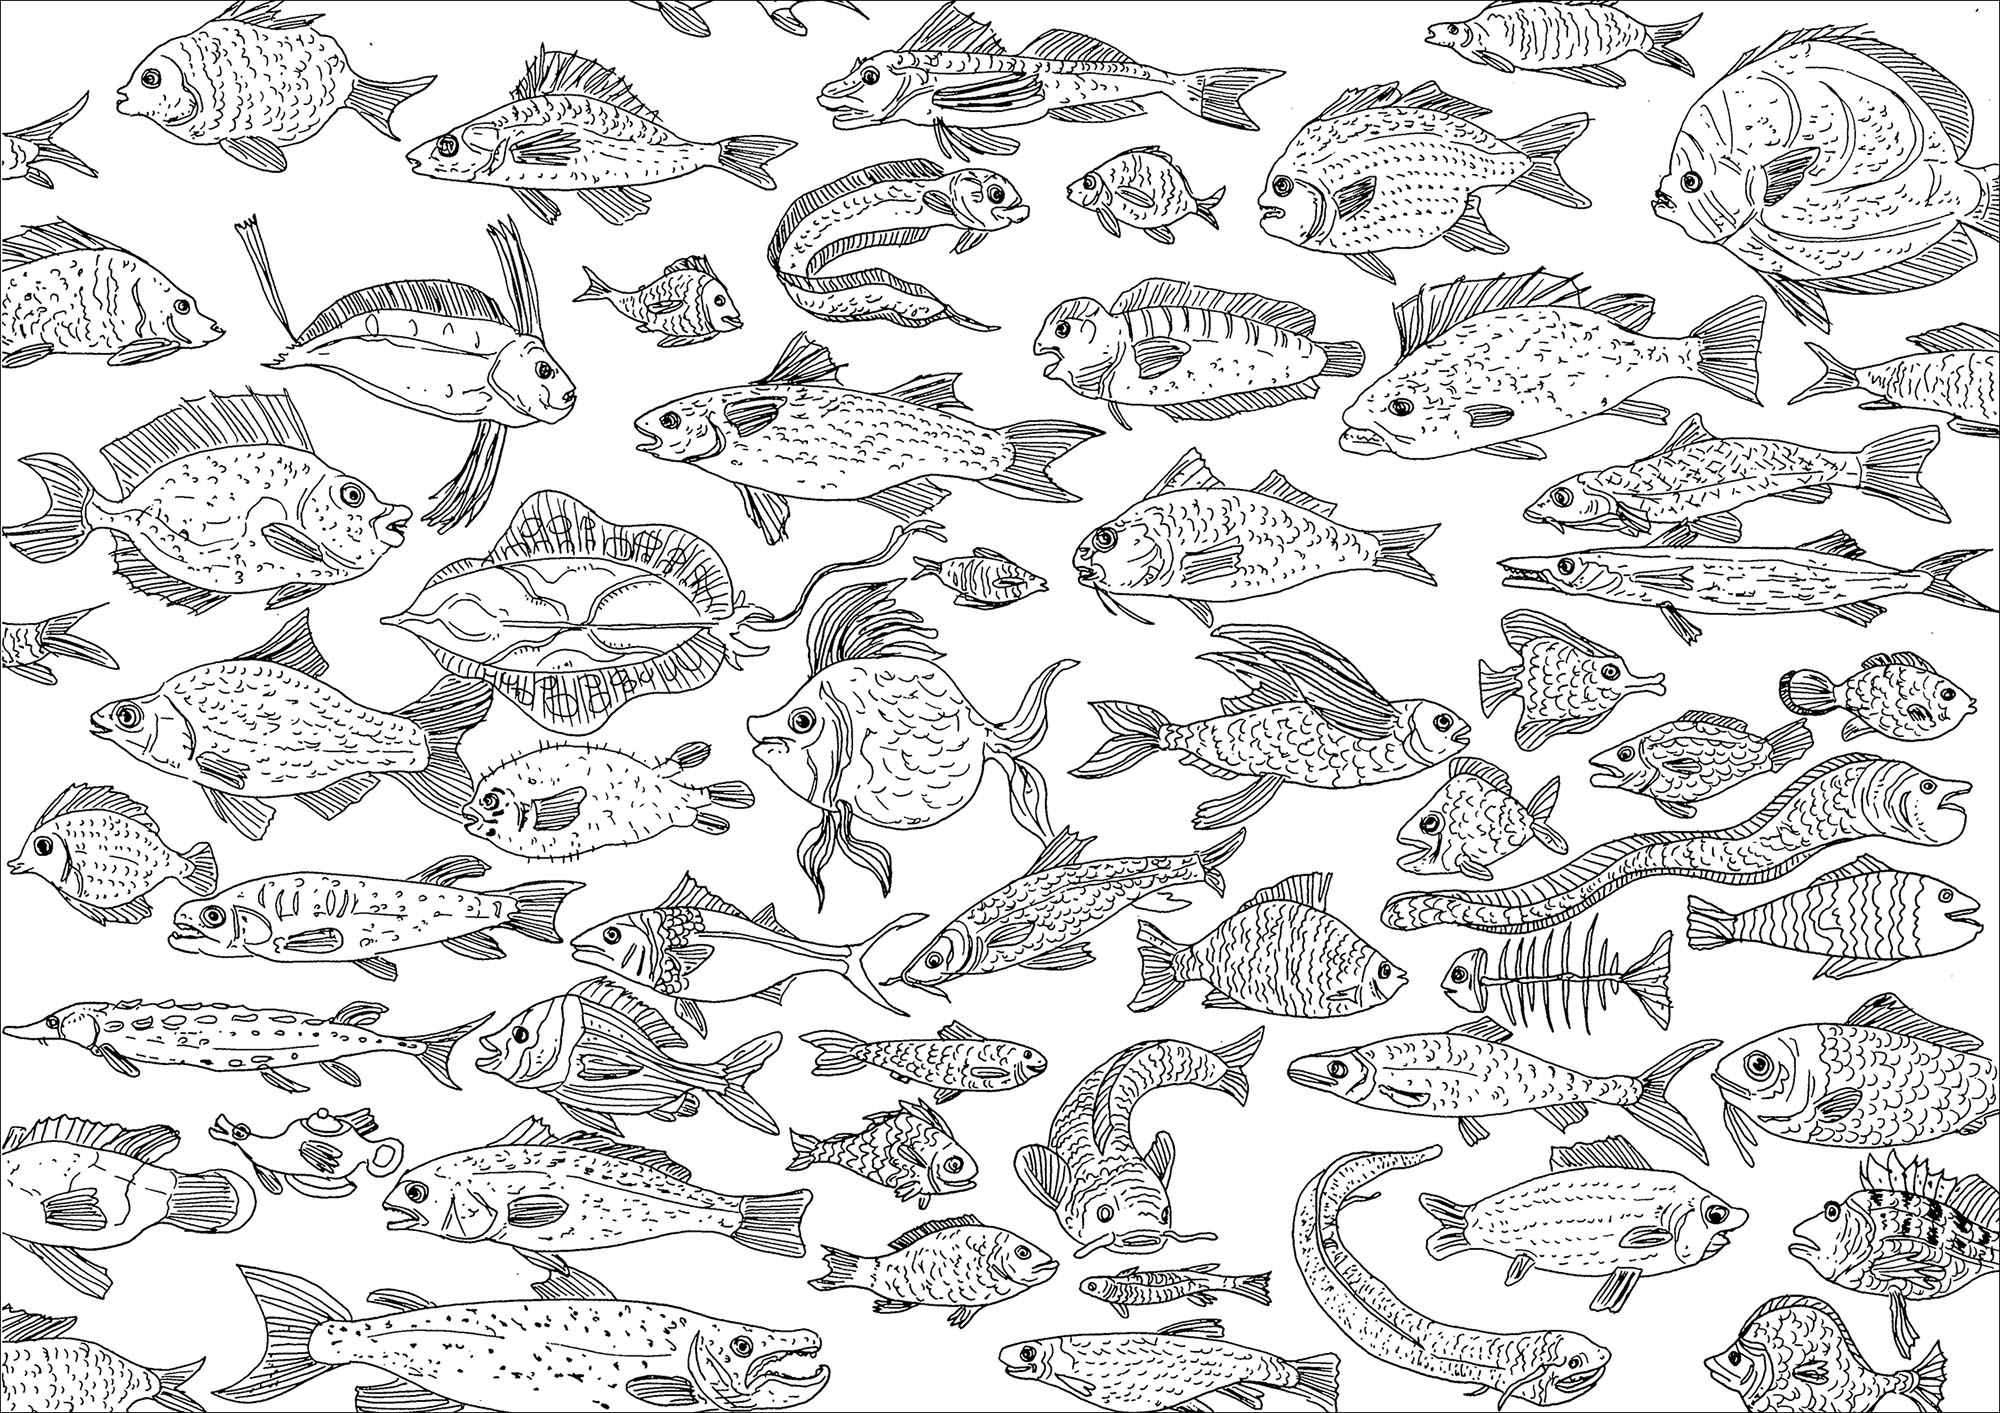 Pesci 63487 pesci disegni da colorare per adulti - Pagine da colorare pesci per adulti ...